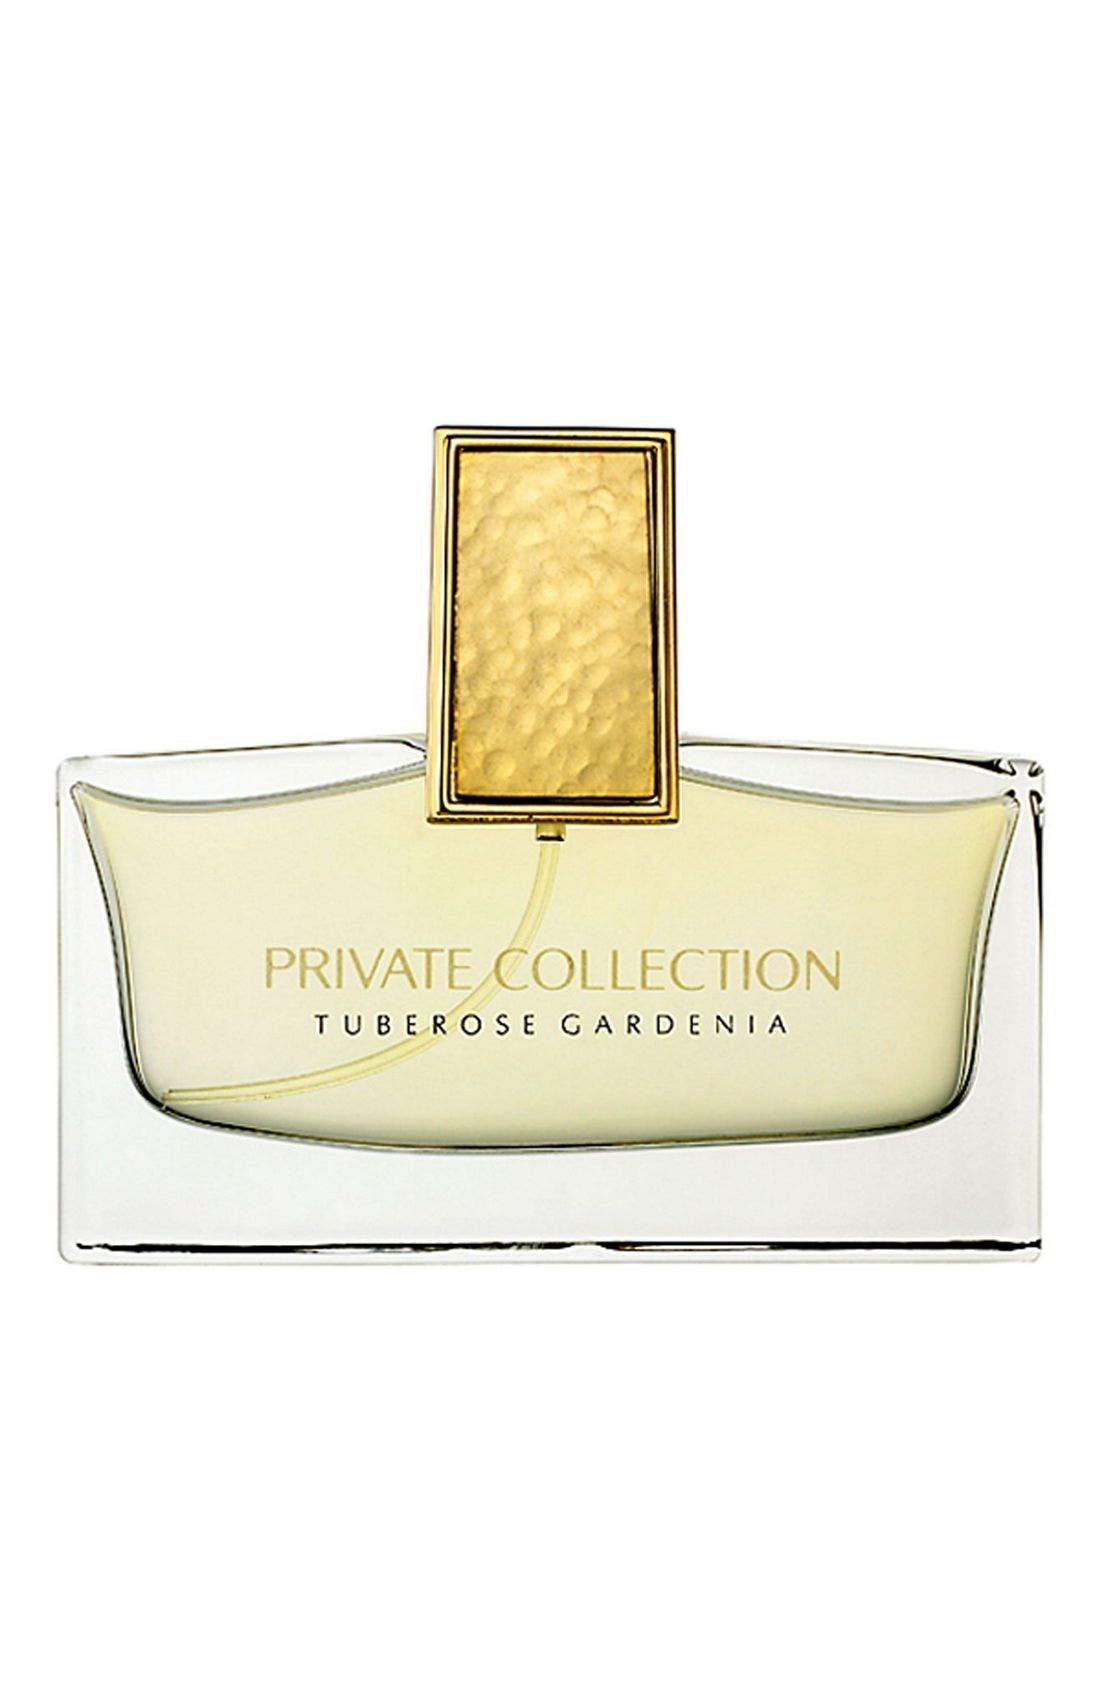 Estée Lauder Private Collection - Tuberose Gardenia Eau de Parfum Spray